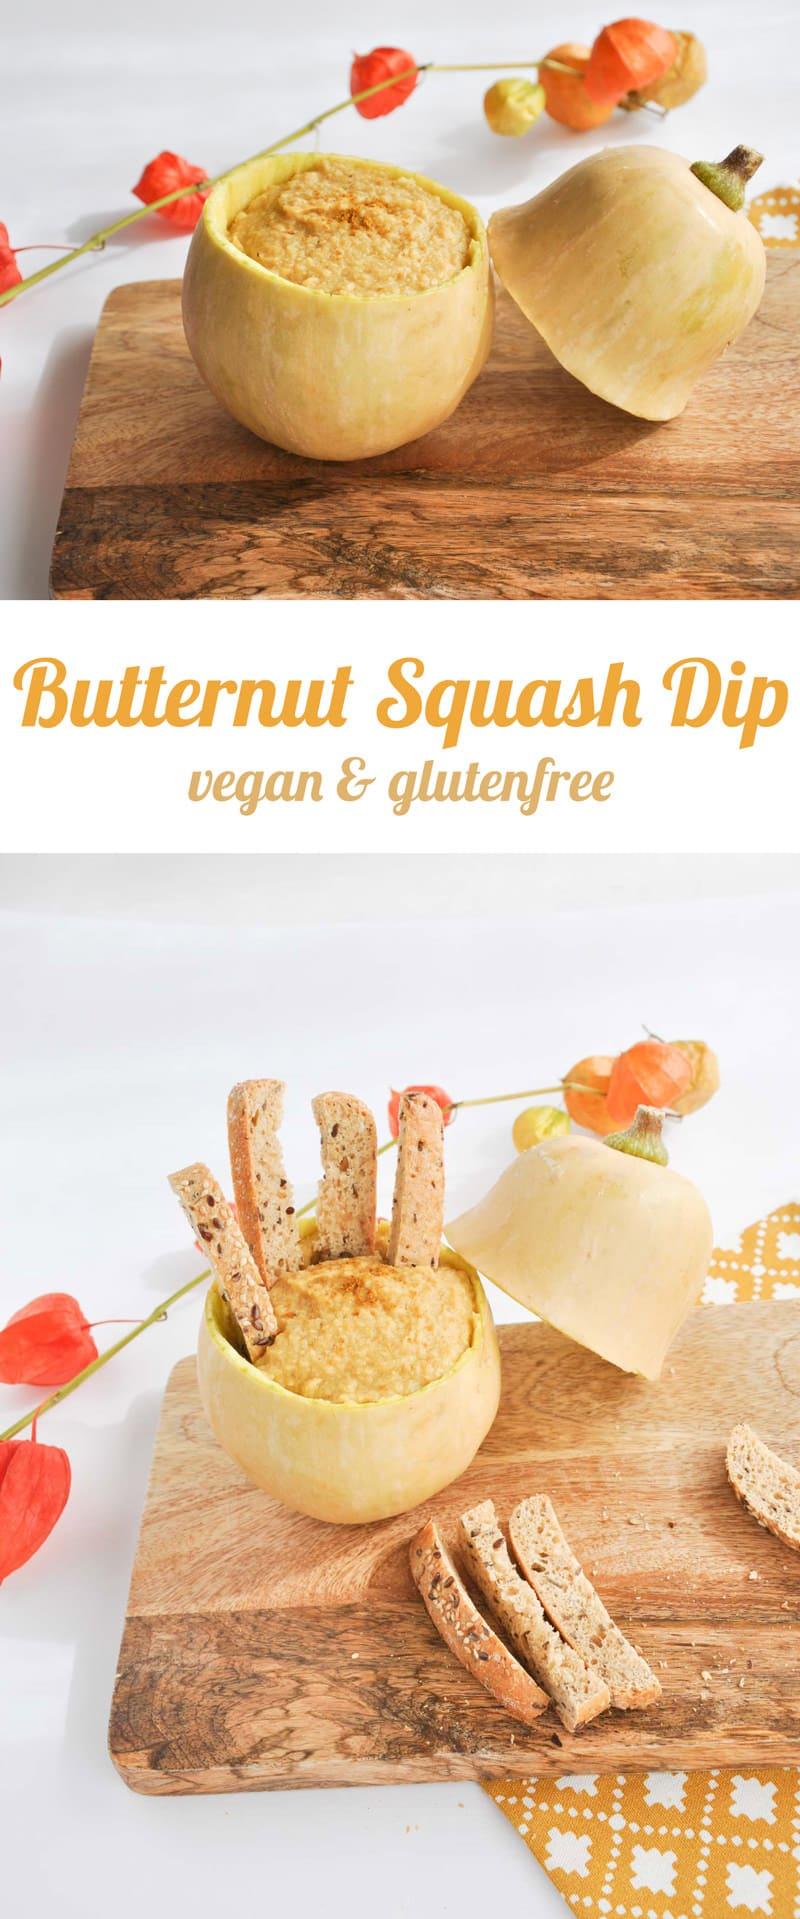 Vegan Butternut Squash Dip | ElephantasticVegan.com